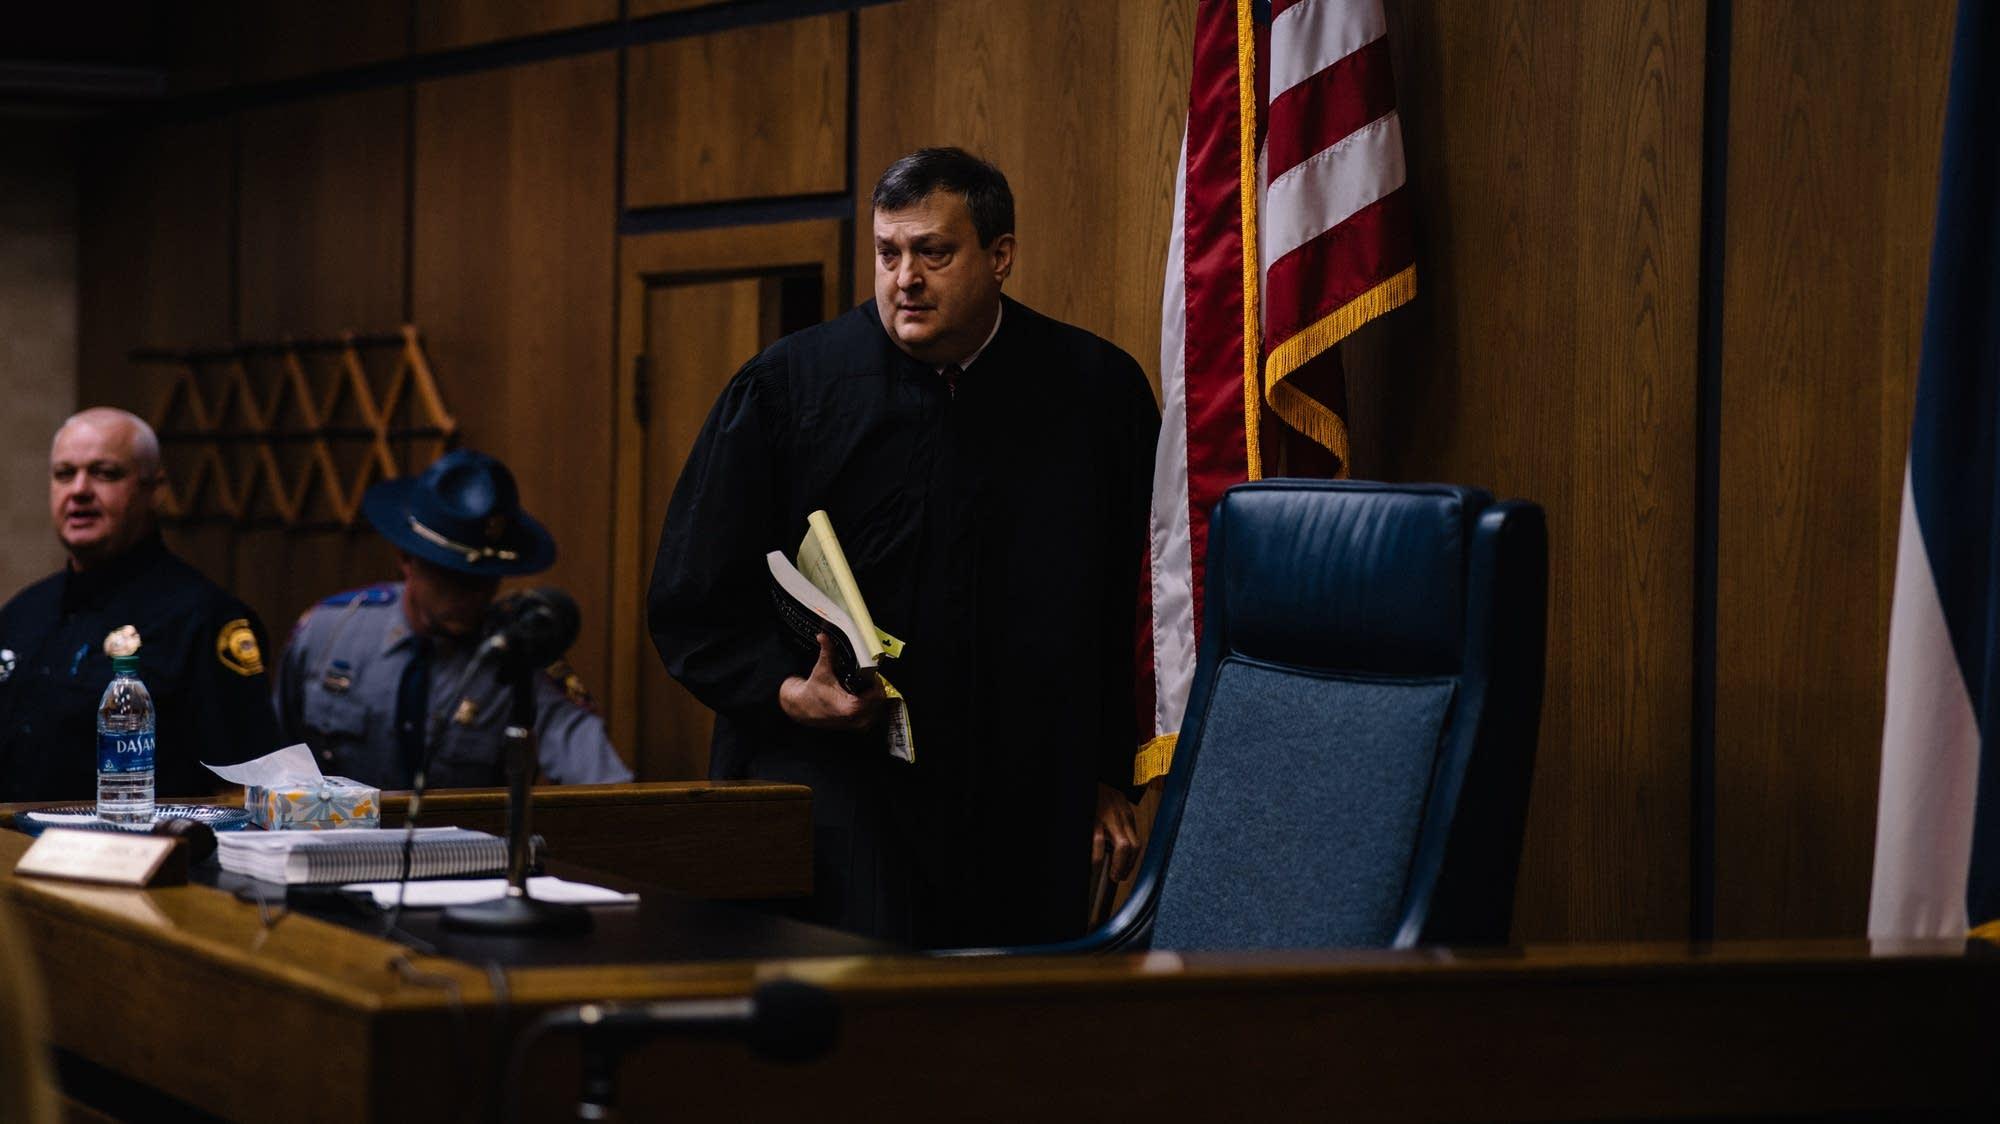 Judge Joey Loper enters the courtroom.